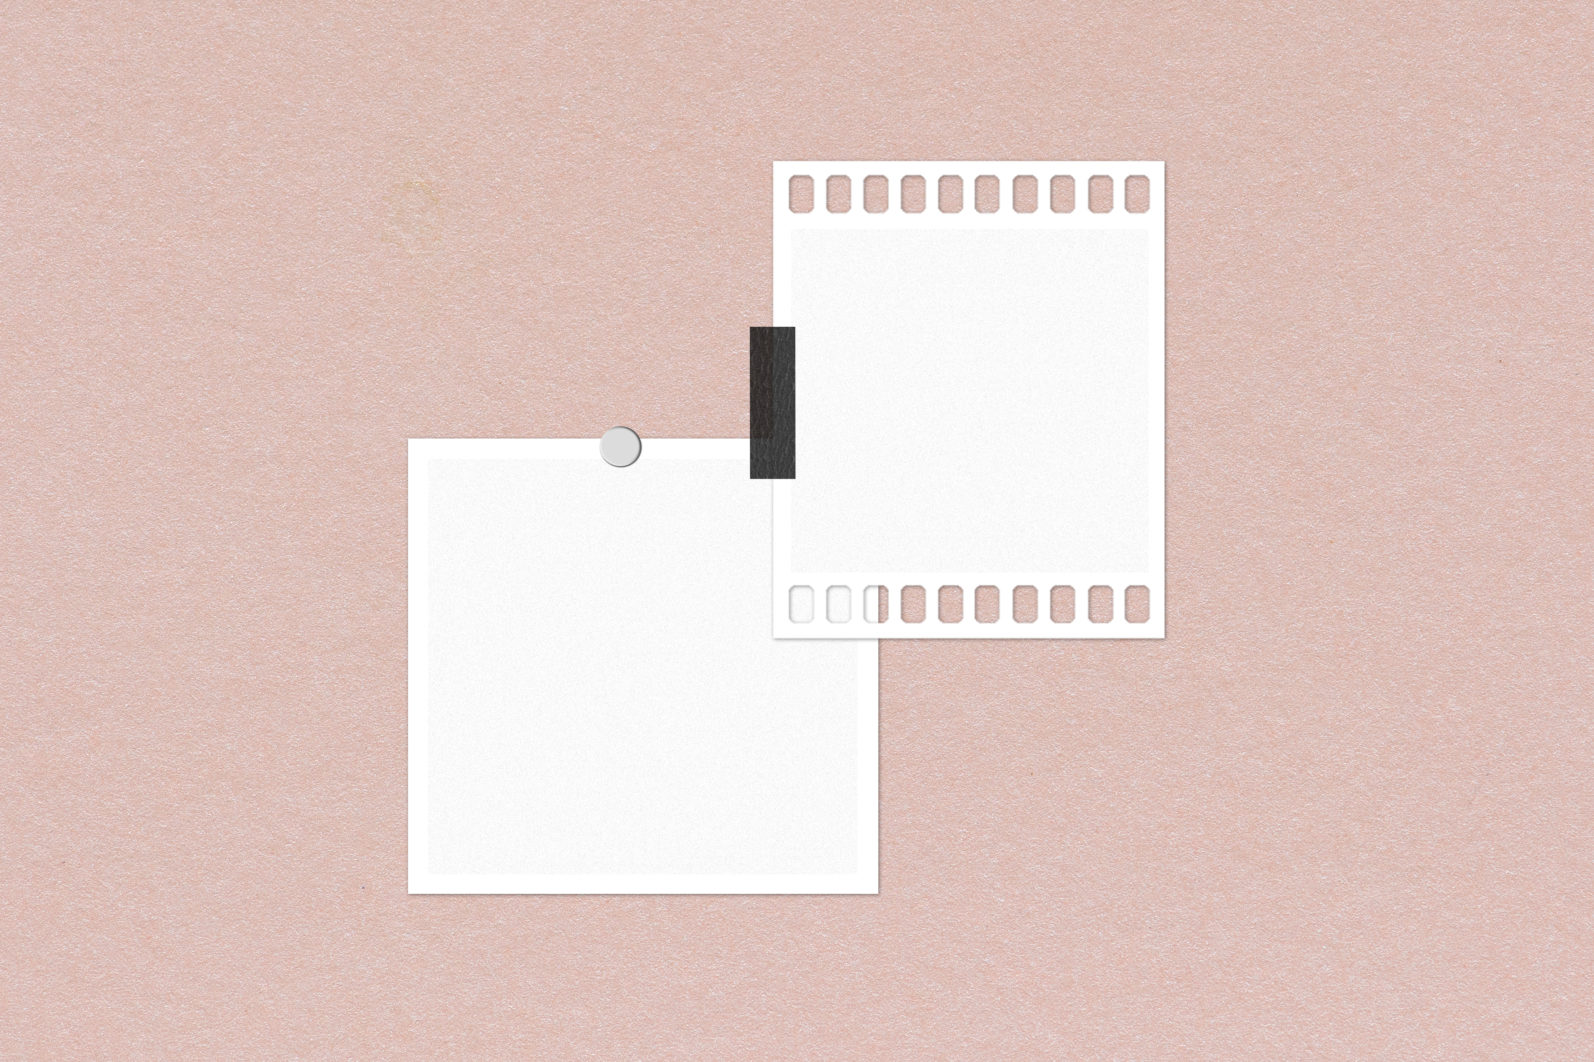 Frame Mockup #1416, White Portrait Photo Frame Mockup, Film Frame Mockup - 1416 Preview 3 scaled -